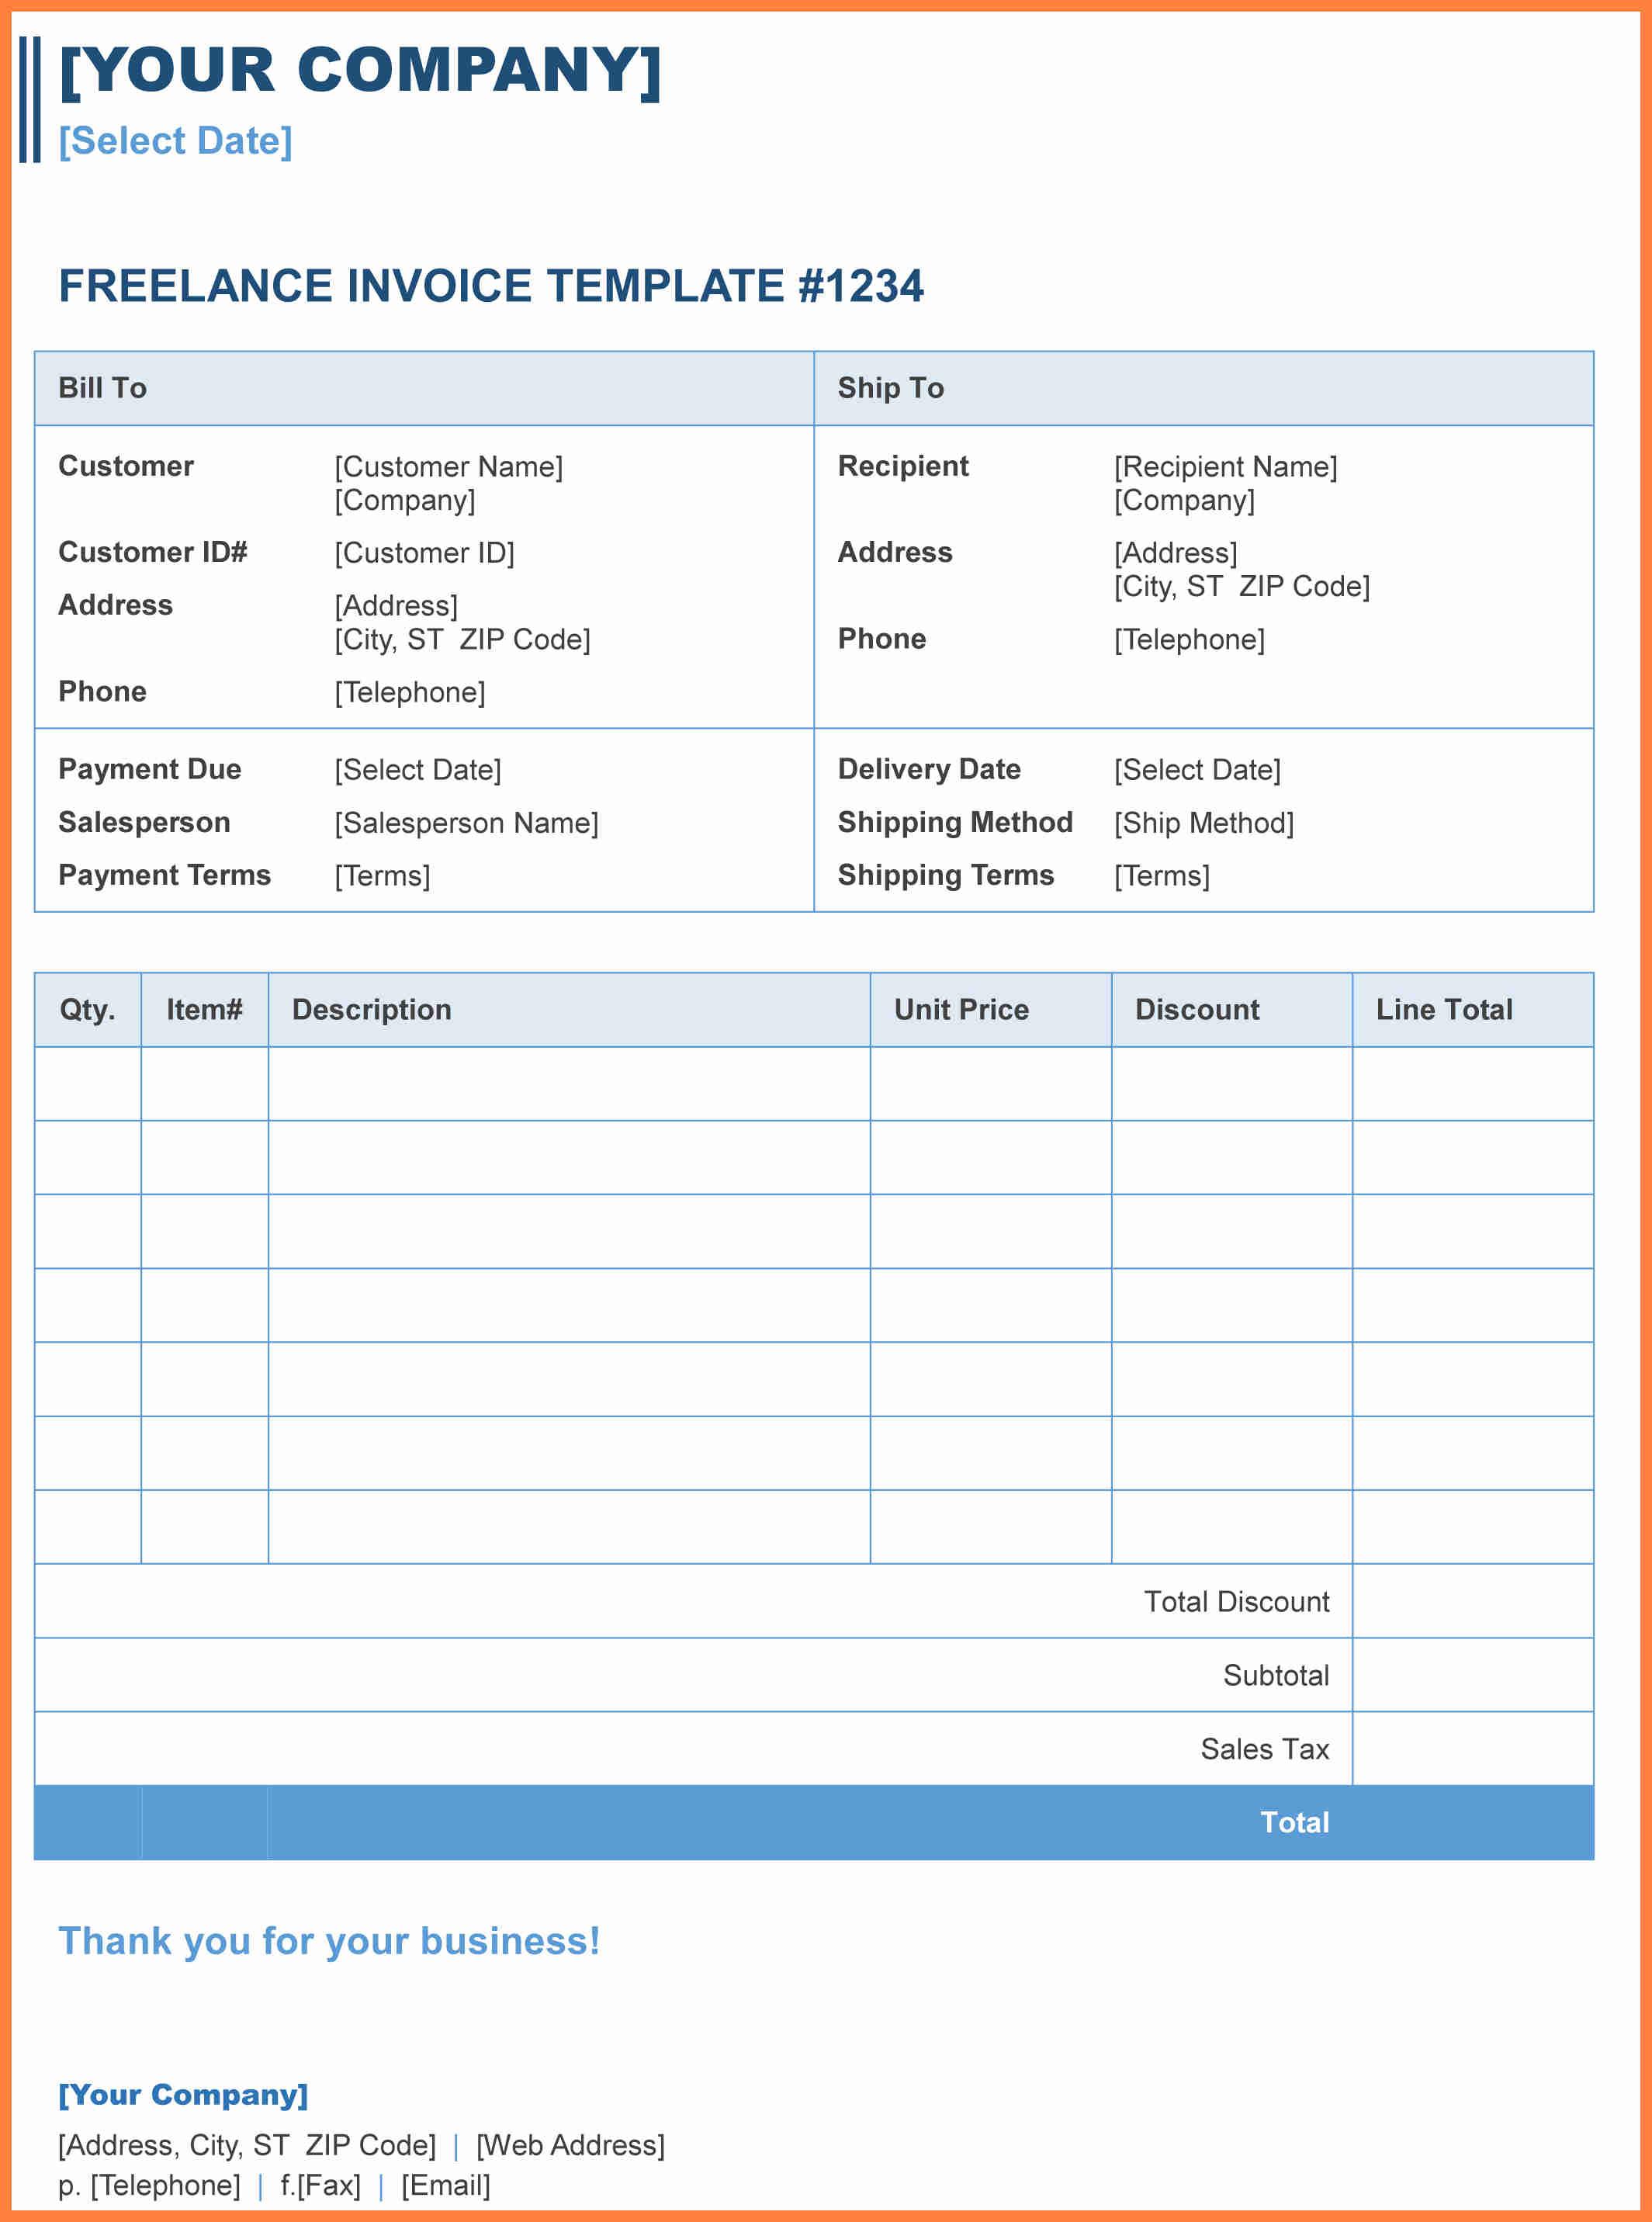 Microsoft Word 2007 Invoice Templates Invoice Templates For Microsoft Word Microsoft Spreadsheet Template Spreadsheet Templates for Busines Microsoft Spreadsheet Template Spreadsheet Templates for Busines Microsoft Word Invoice Template Free Download